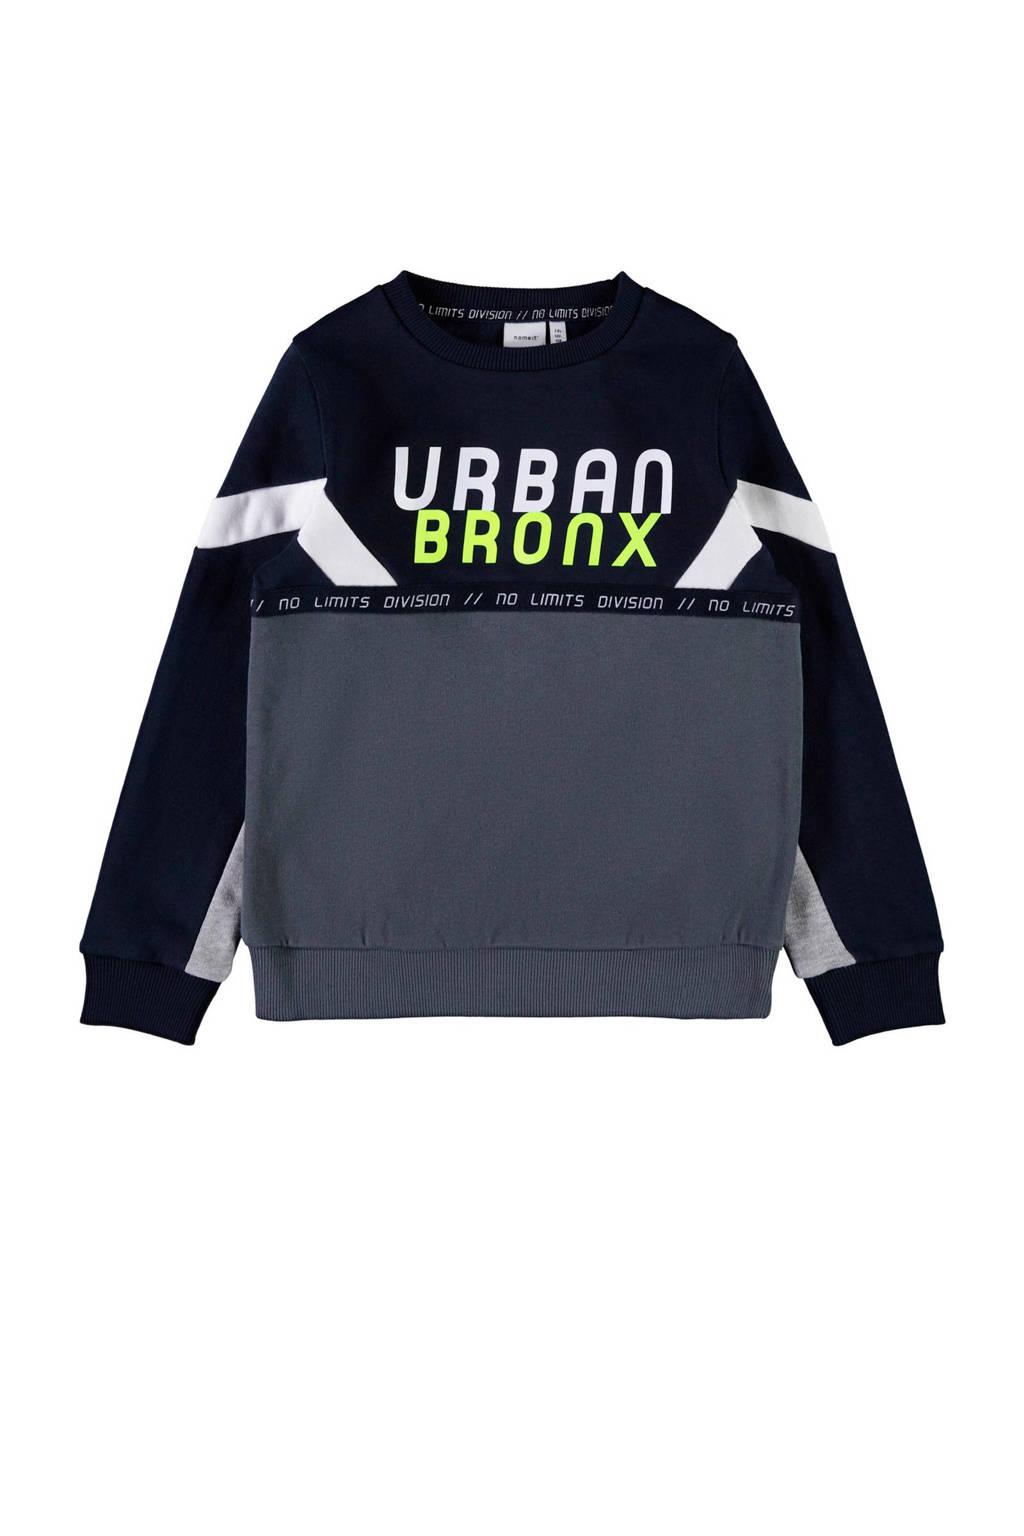 NAME IT KIDS sweater donkerblauw/grijs/wit, Donkerblauw/grijs/wit